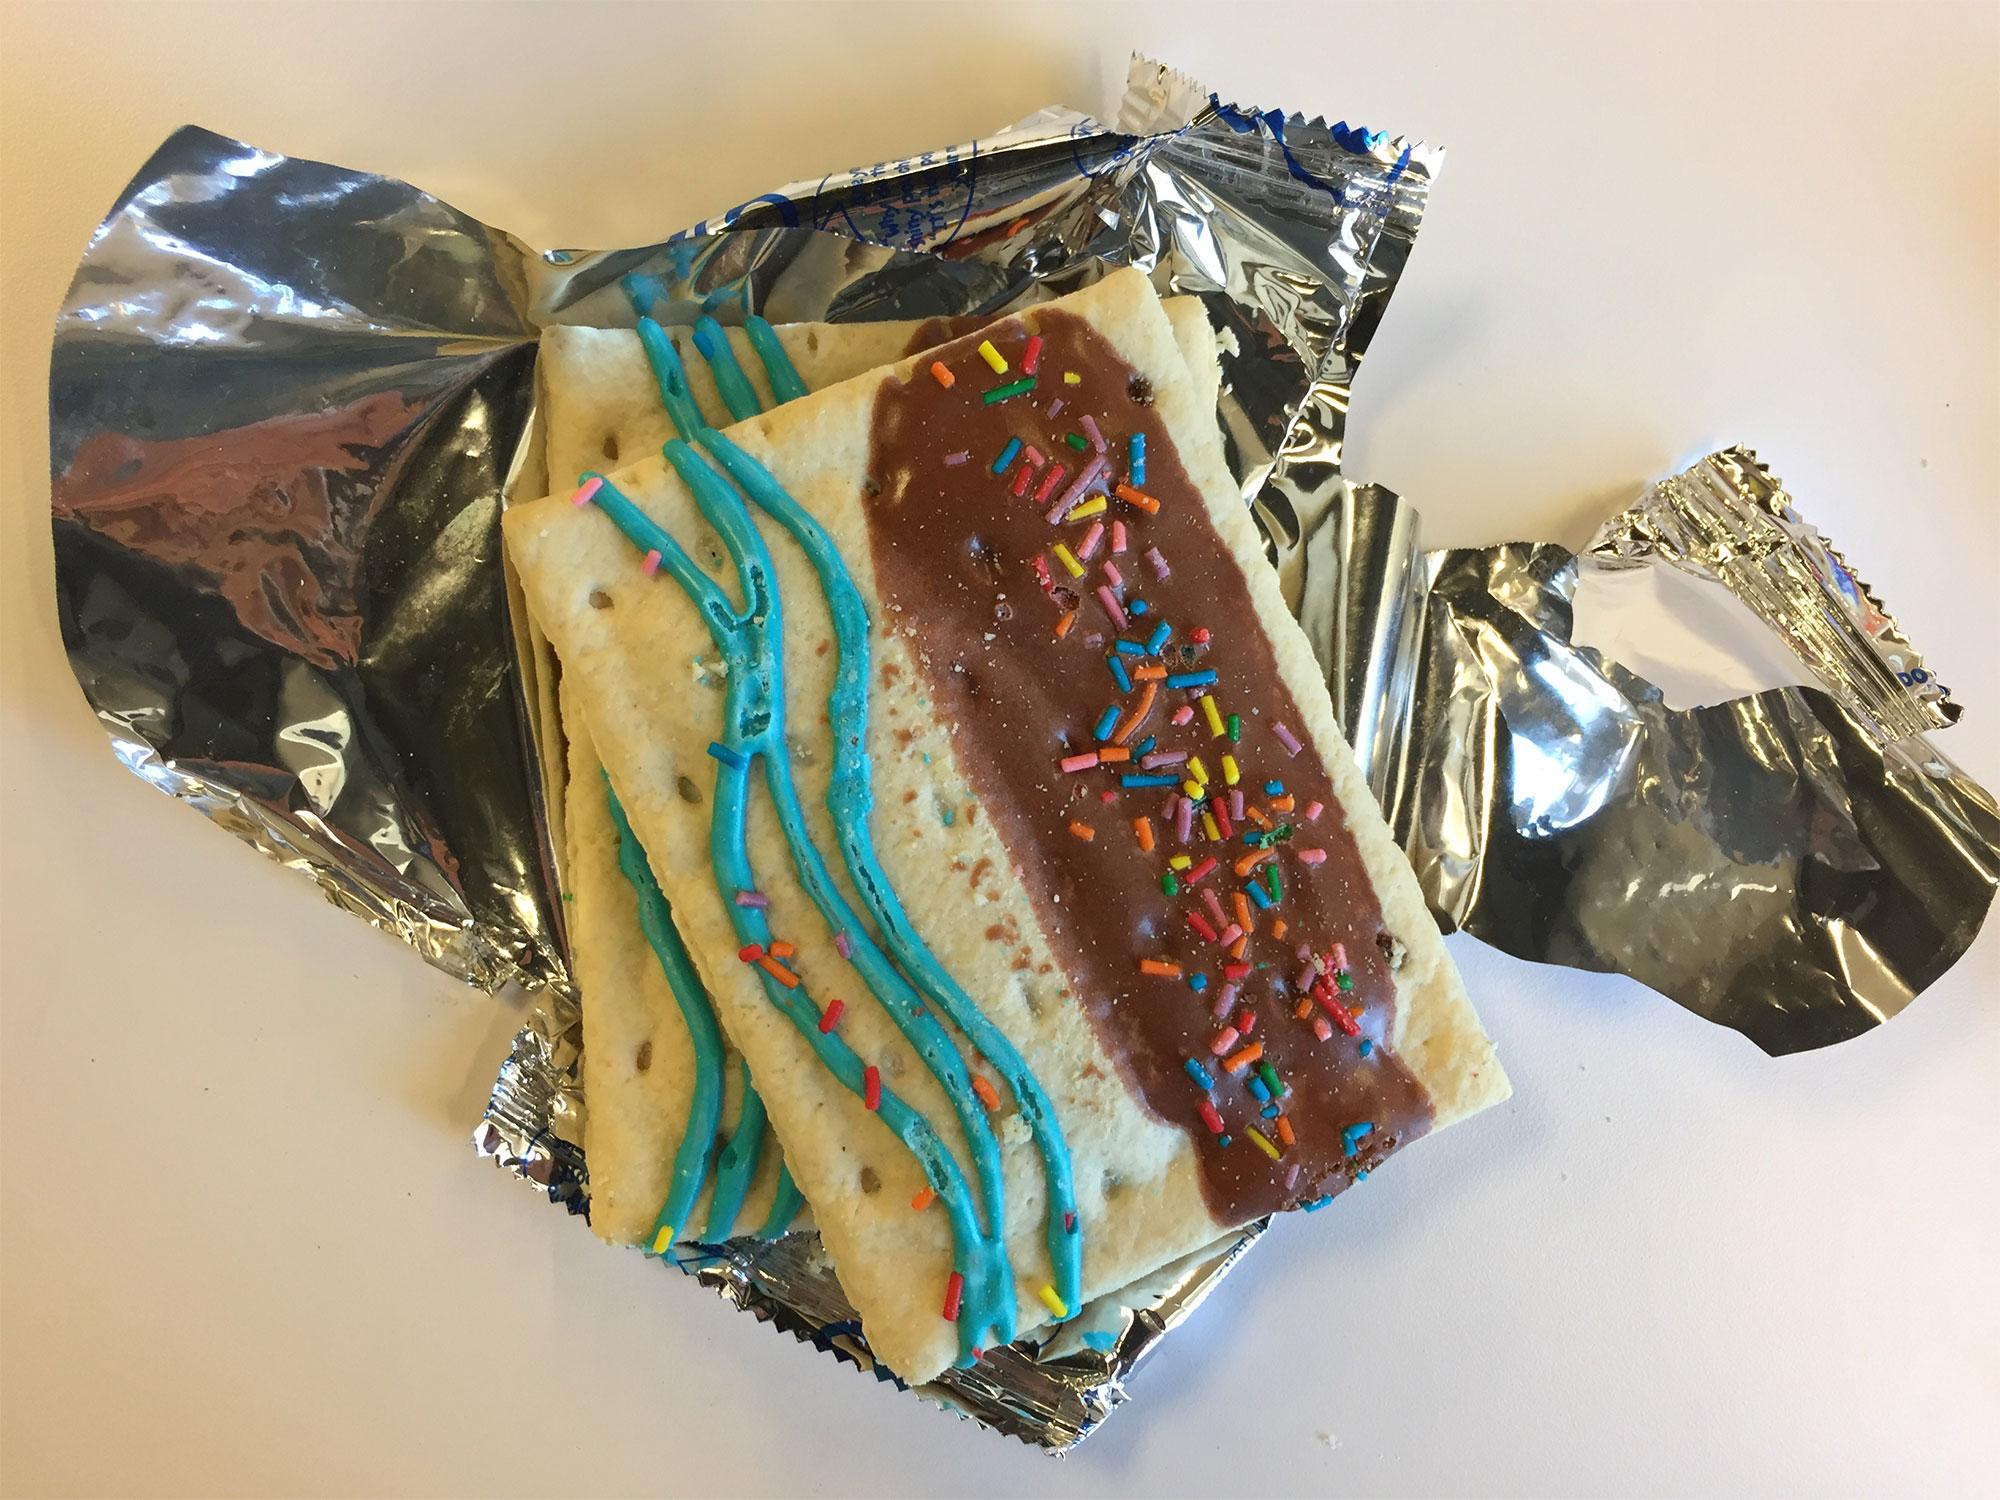 pop-tarts-splitz-brownie.jpg